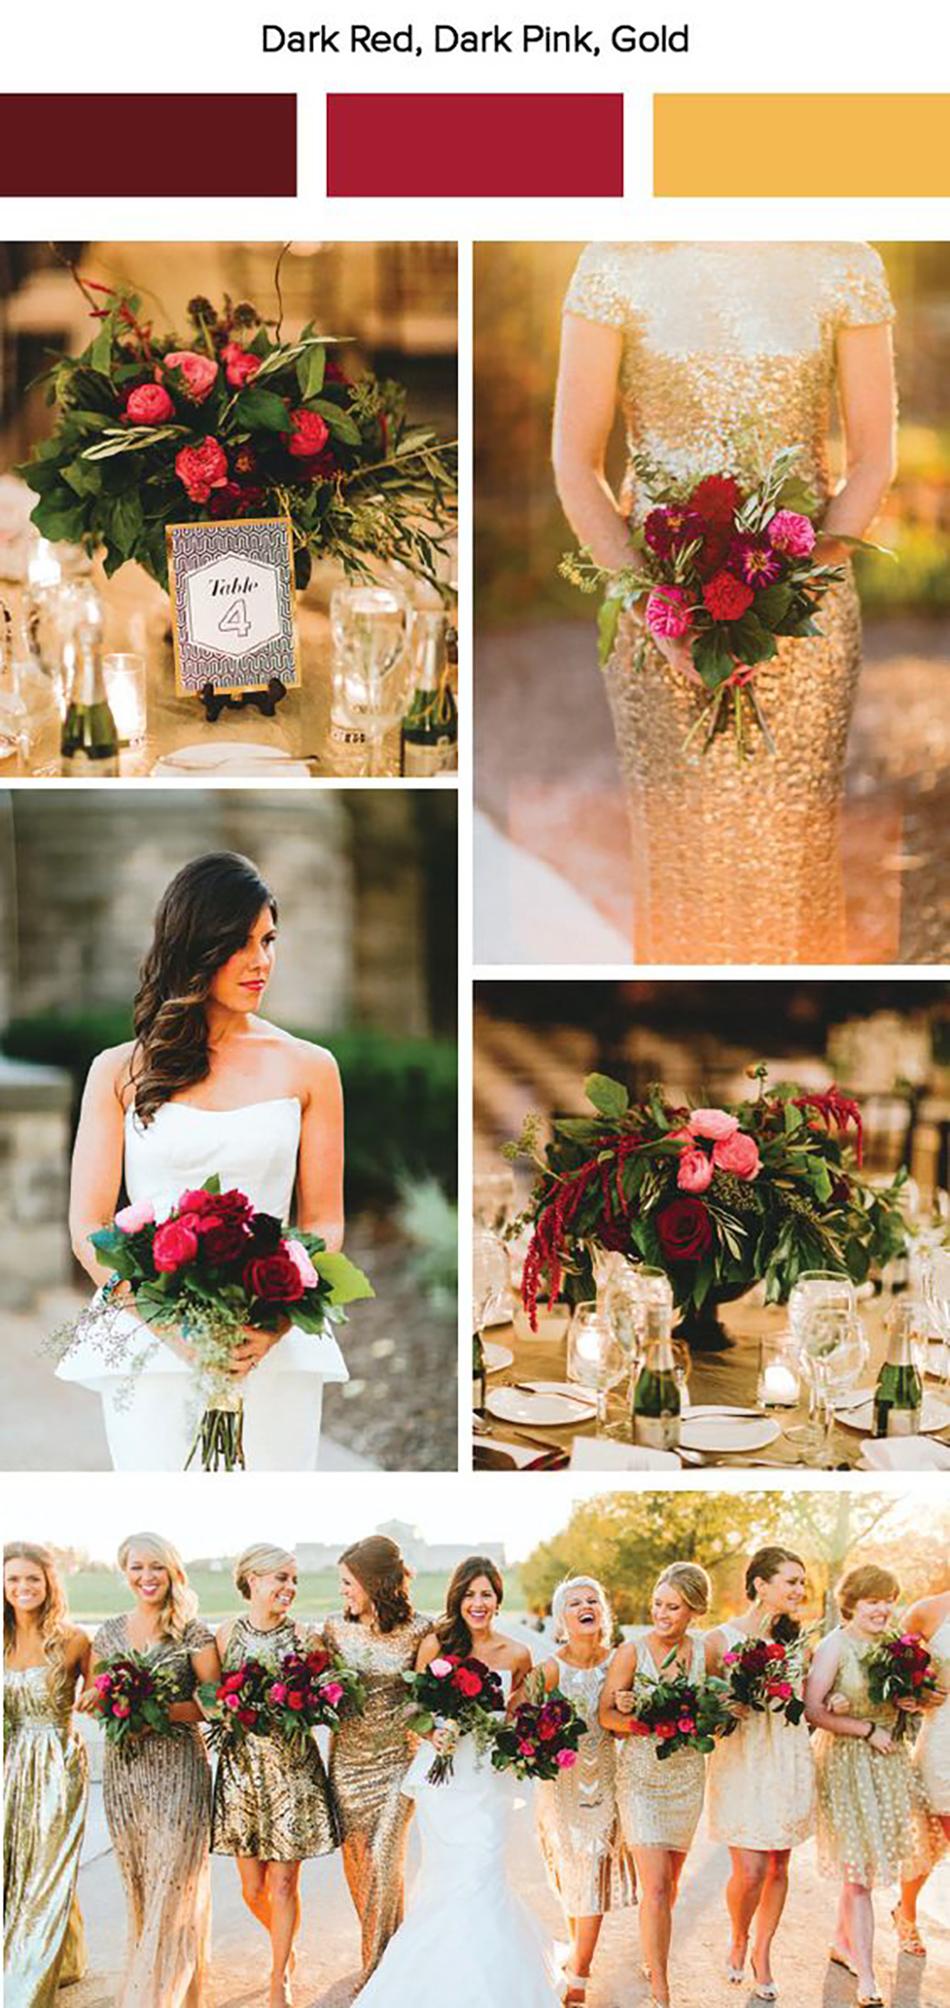 Metallic Bridesmaid Dresses Wedding Ideas Chwv,Plus Size Designer Wedding Dress